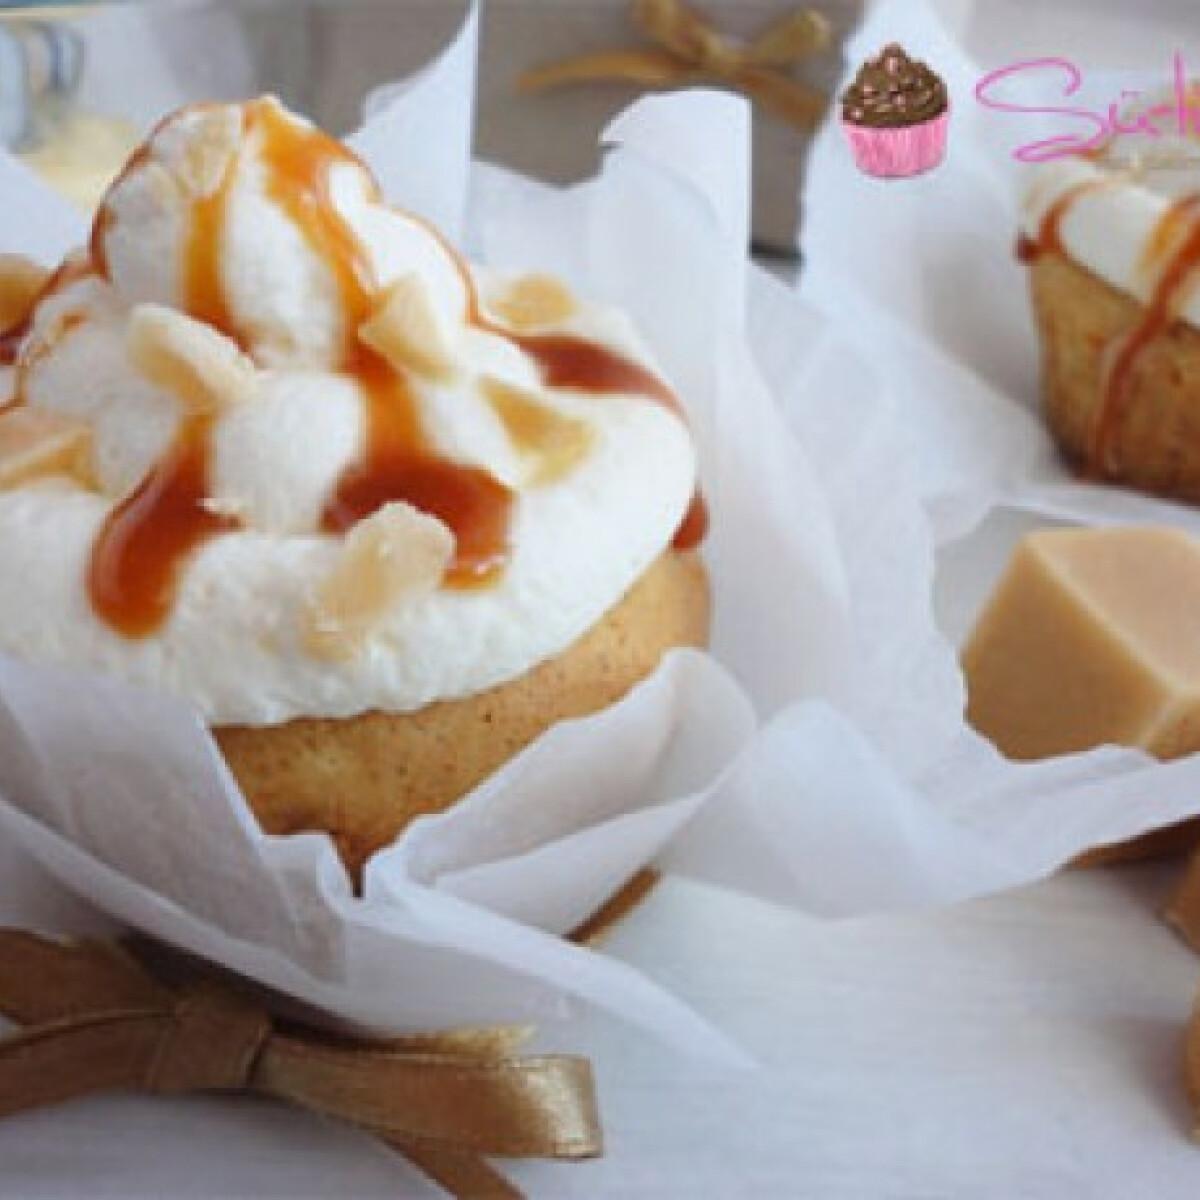 Ezen a képen: Francia krémes cupcake